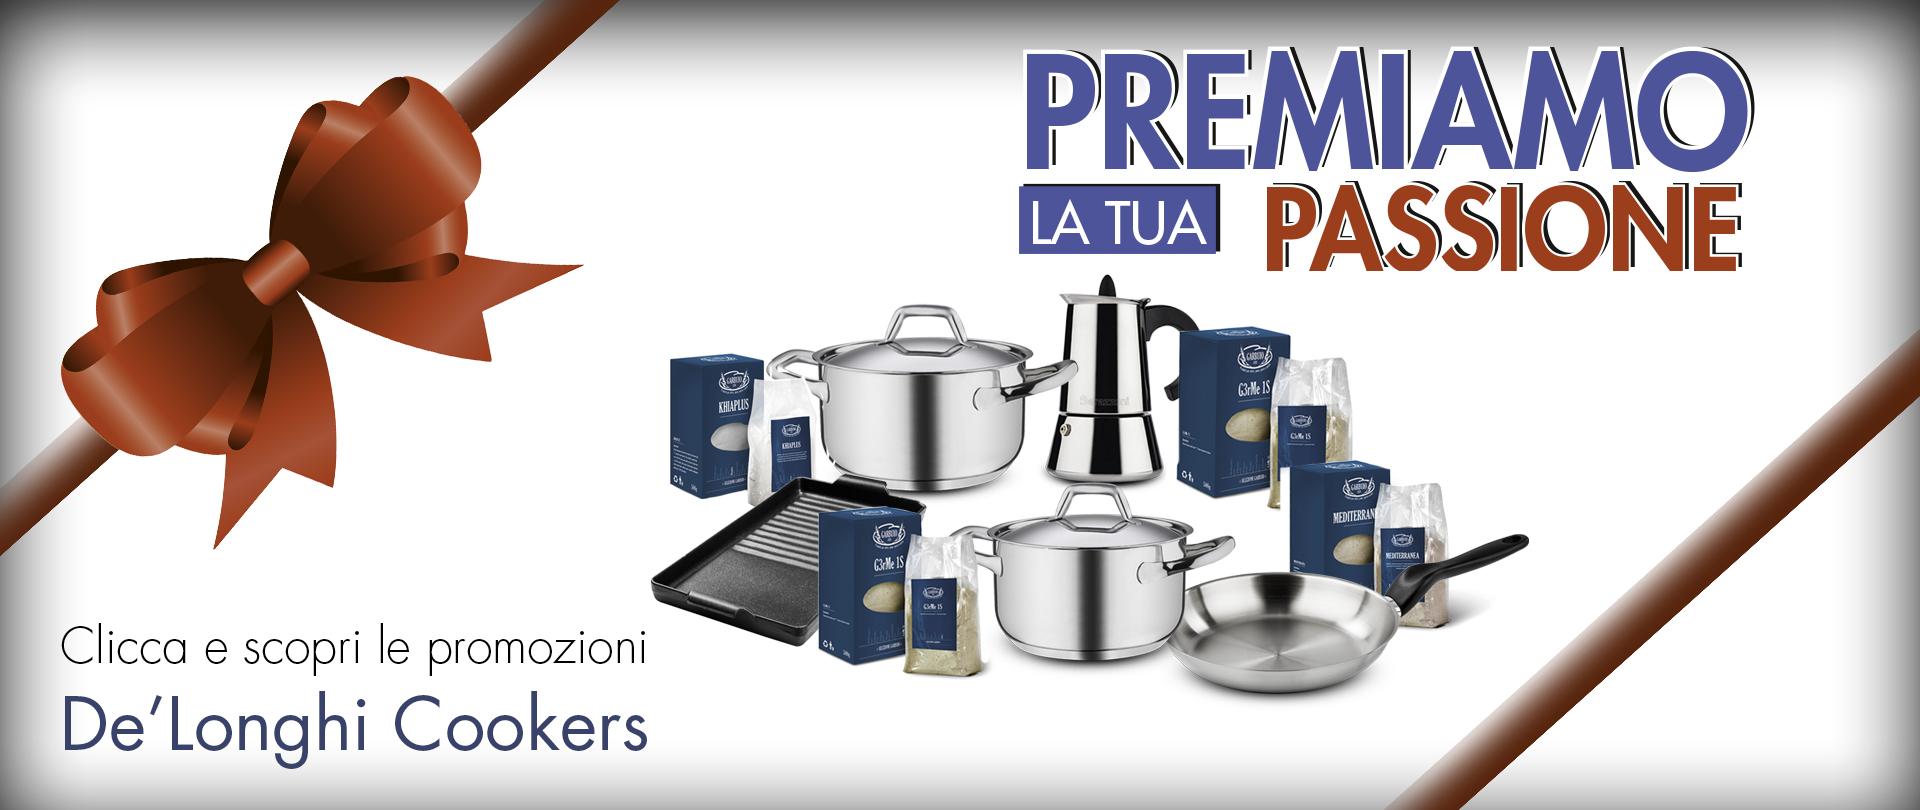 Promozioni De'Longhi Cookers 2019